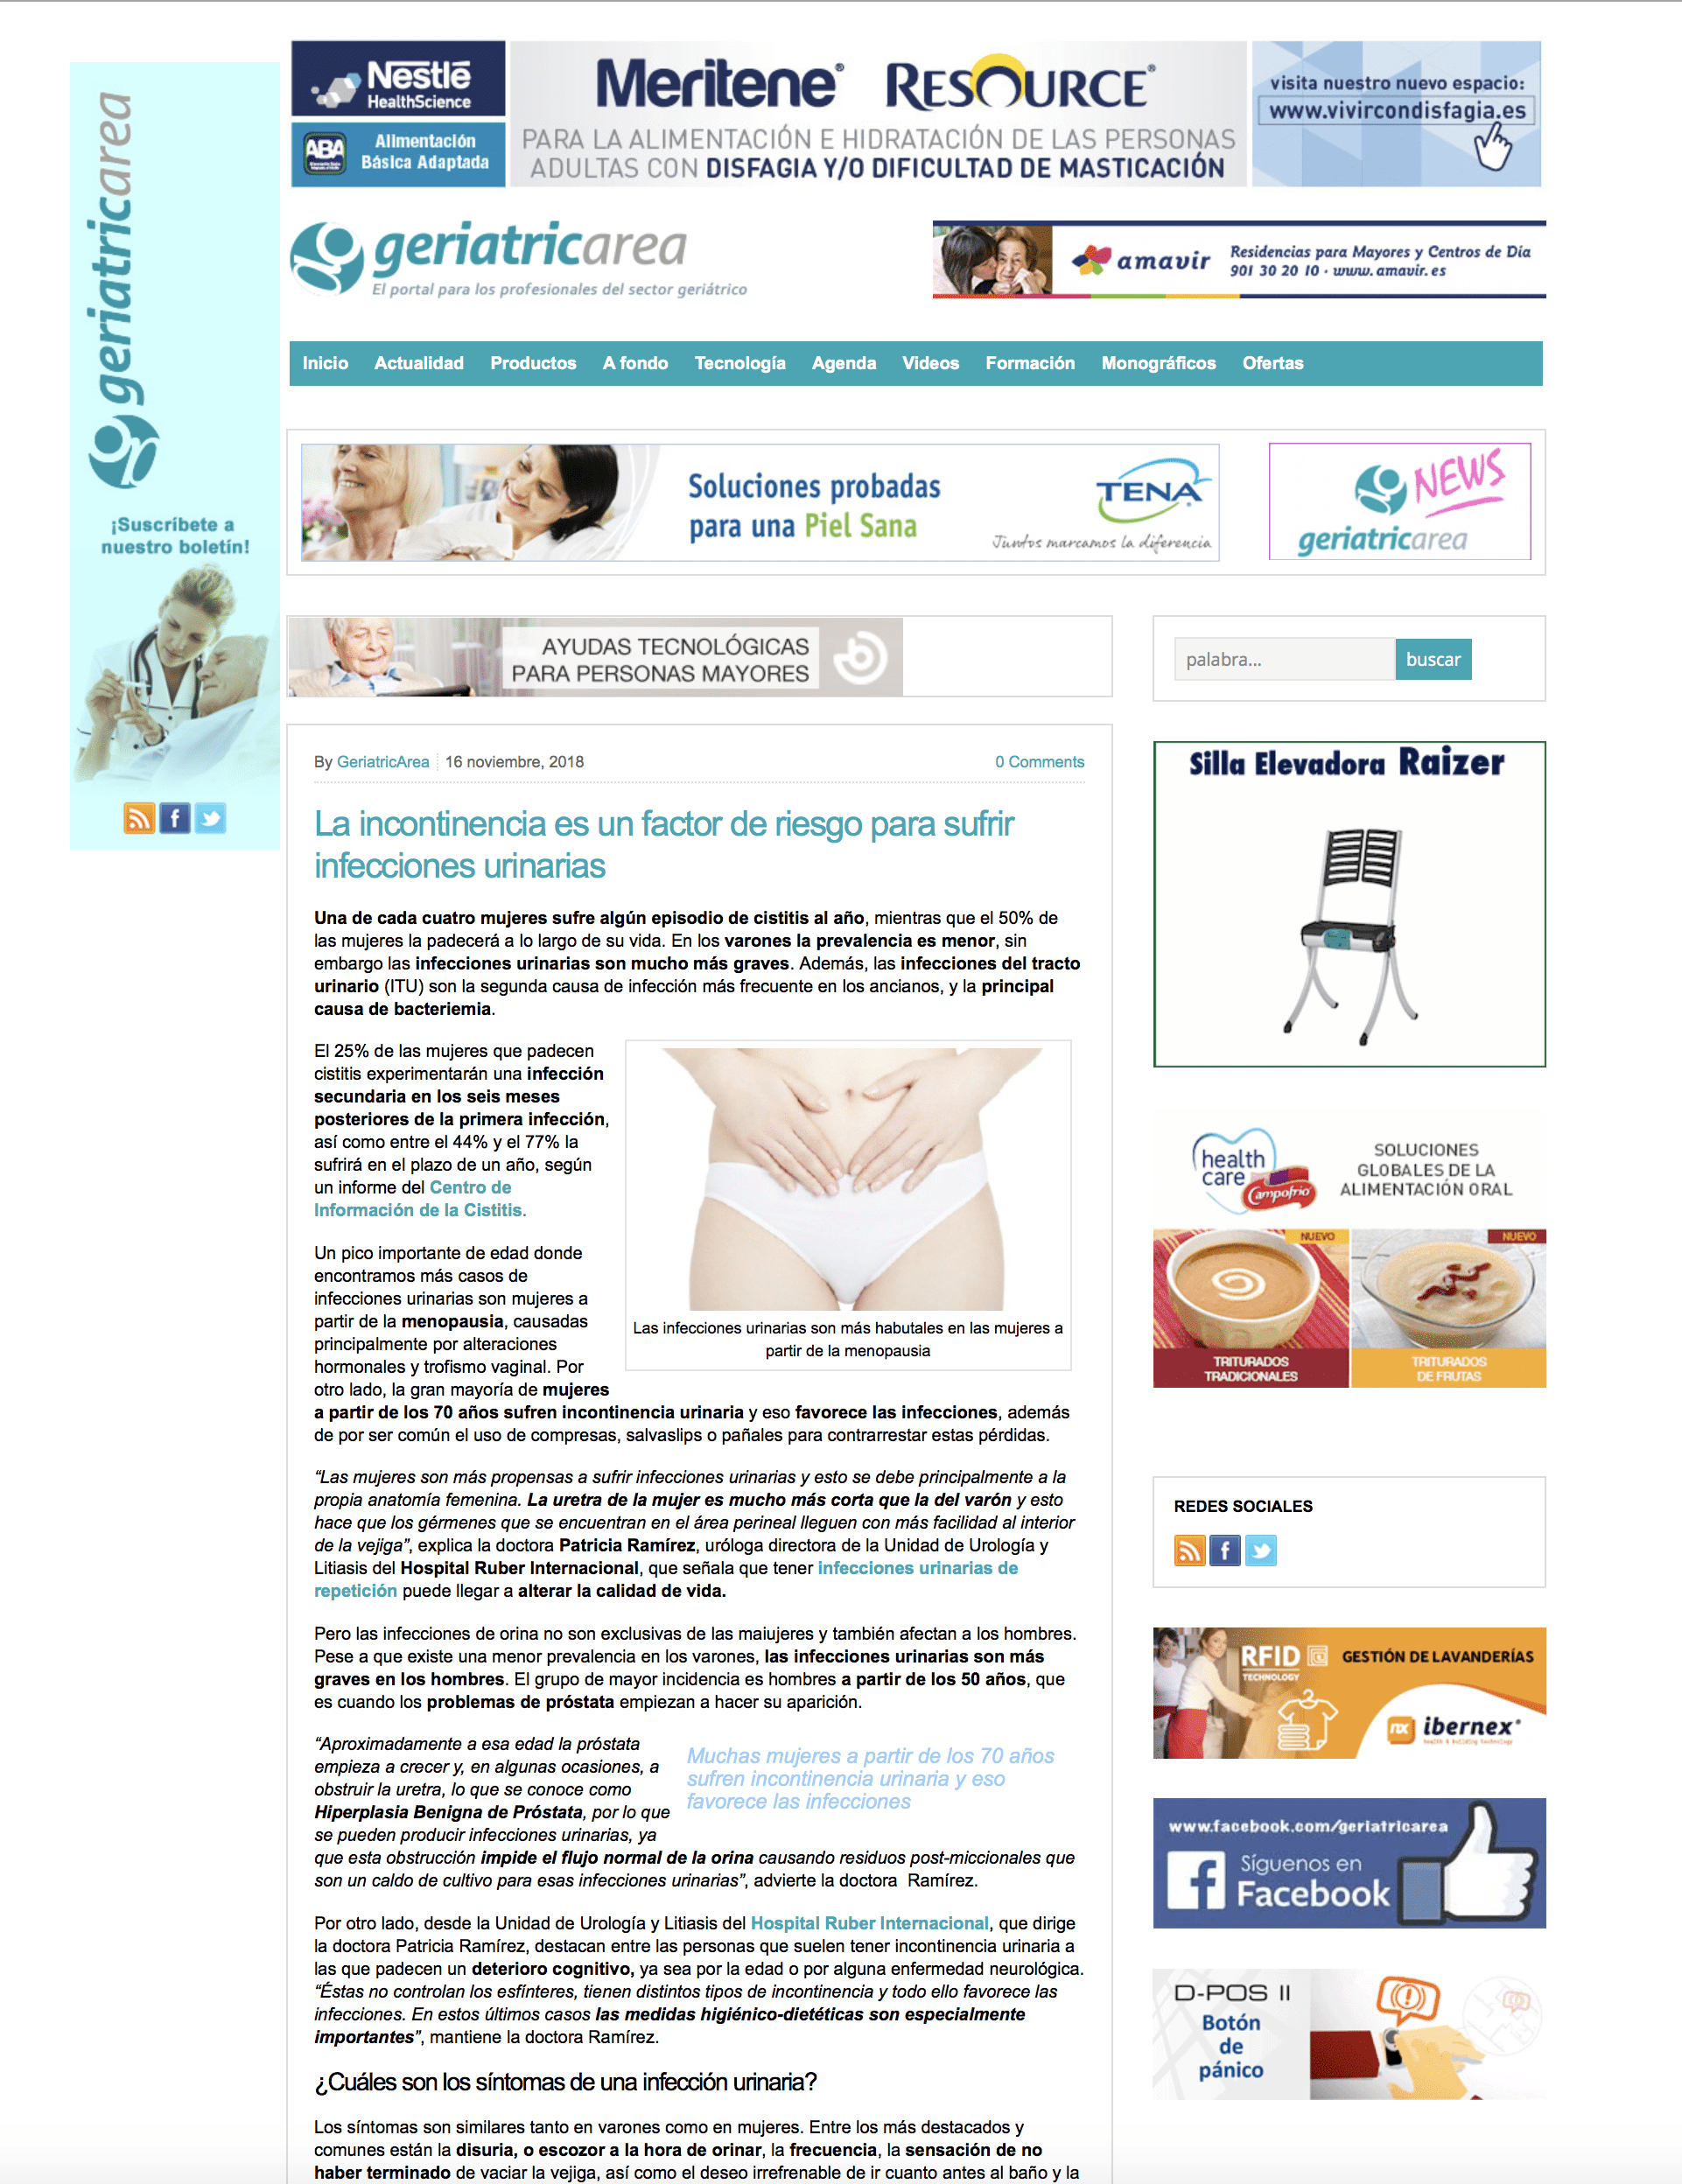 Geriatricarea, pantalla con noticia urológica